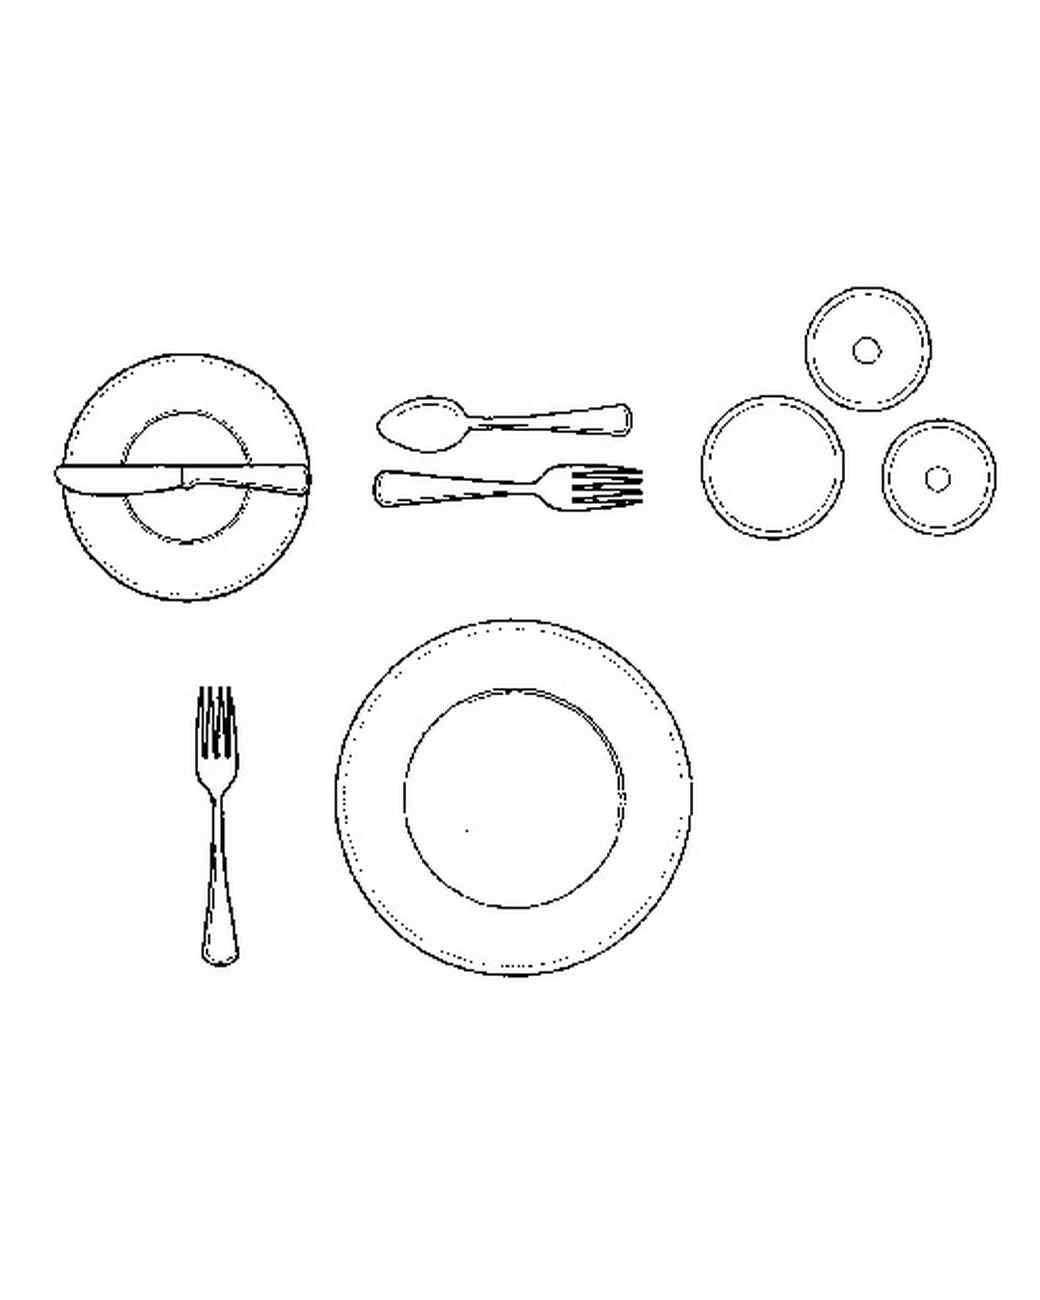 sc 1 st  Martha Stewart & How to Set a Formal Dinner Table | Martha Stewart